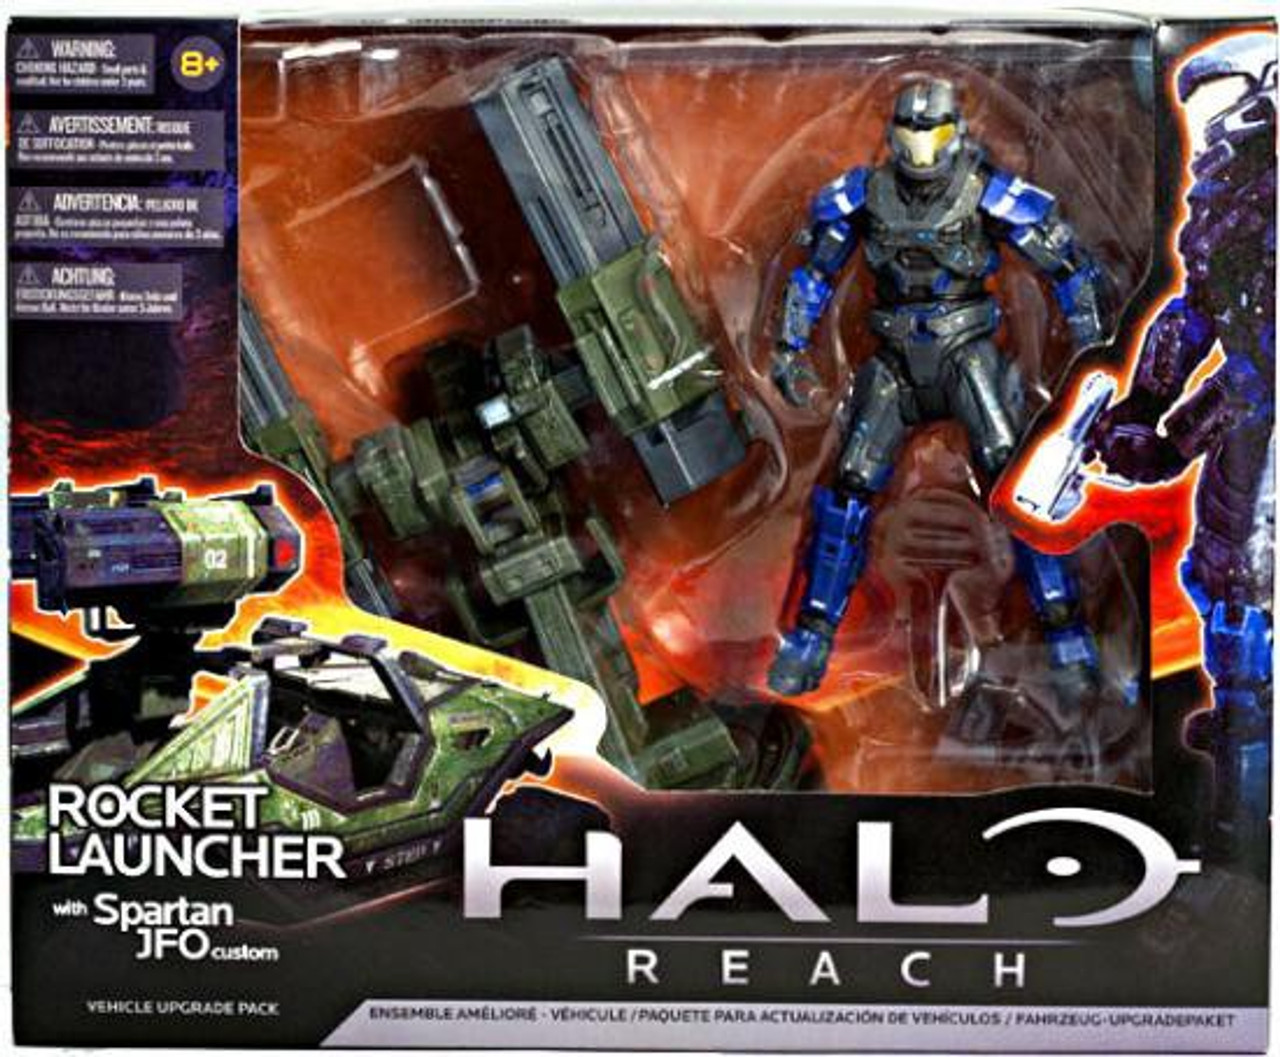 McFarlane Toys Halo Reach Vehicle Upgrade Packs Rocket Launcher with Spartan JFO Custom